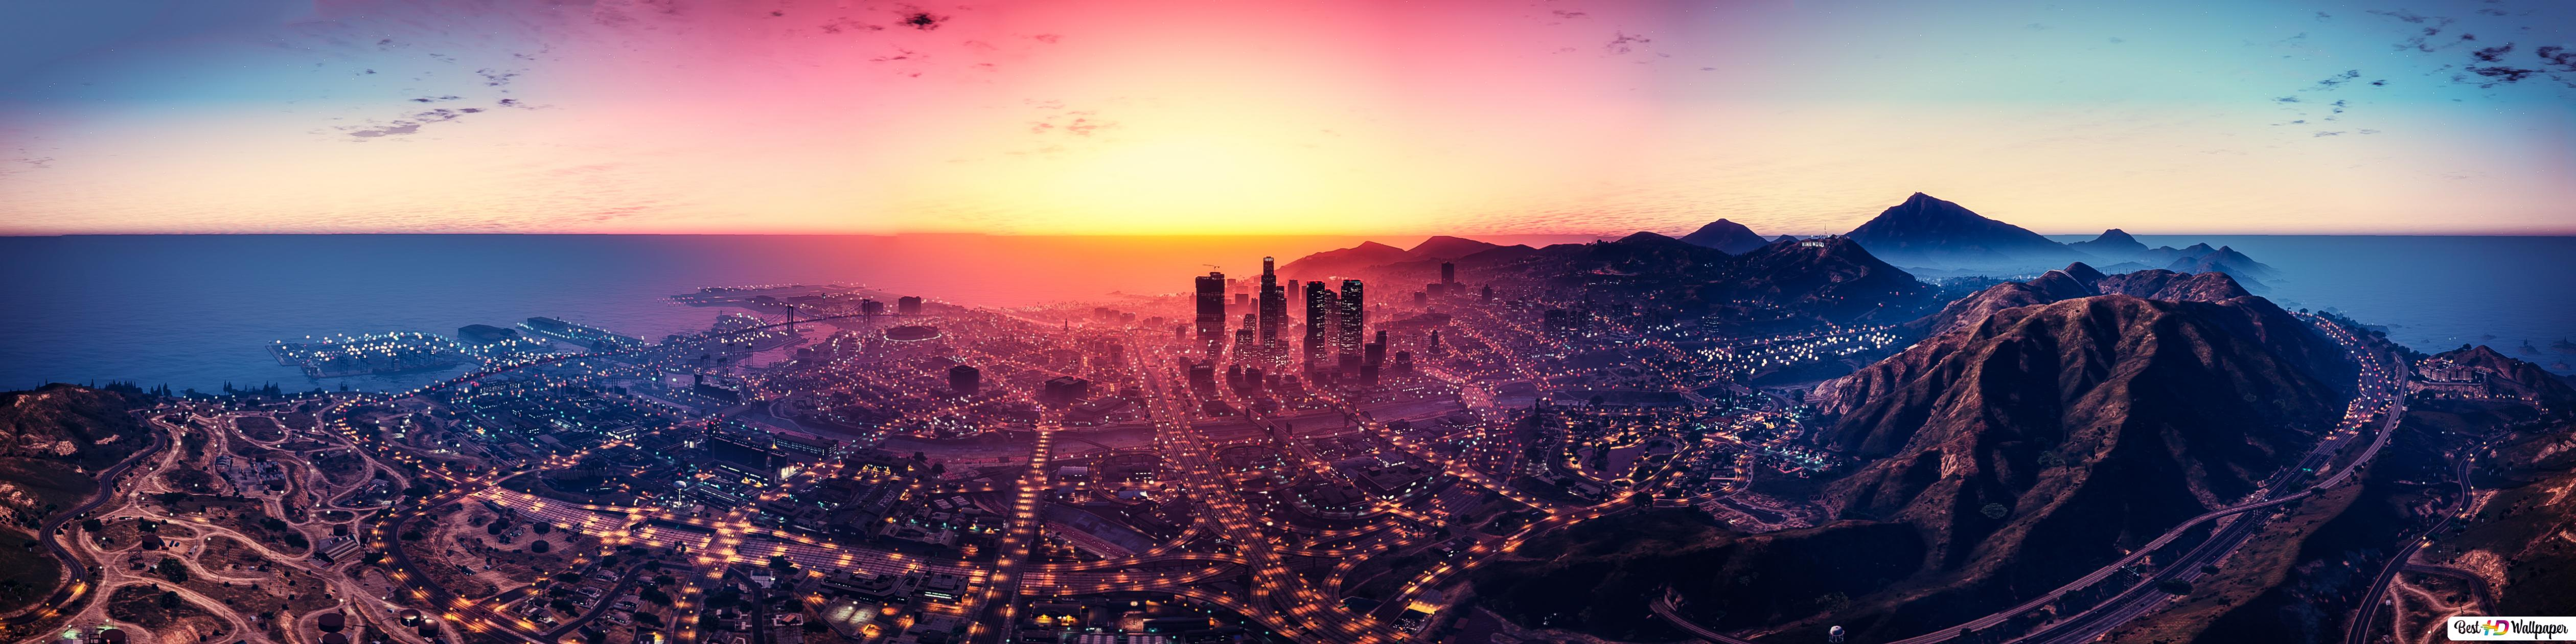 Grand Theft Auto V Los Santos Hd Wallpaper Download